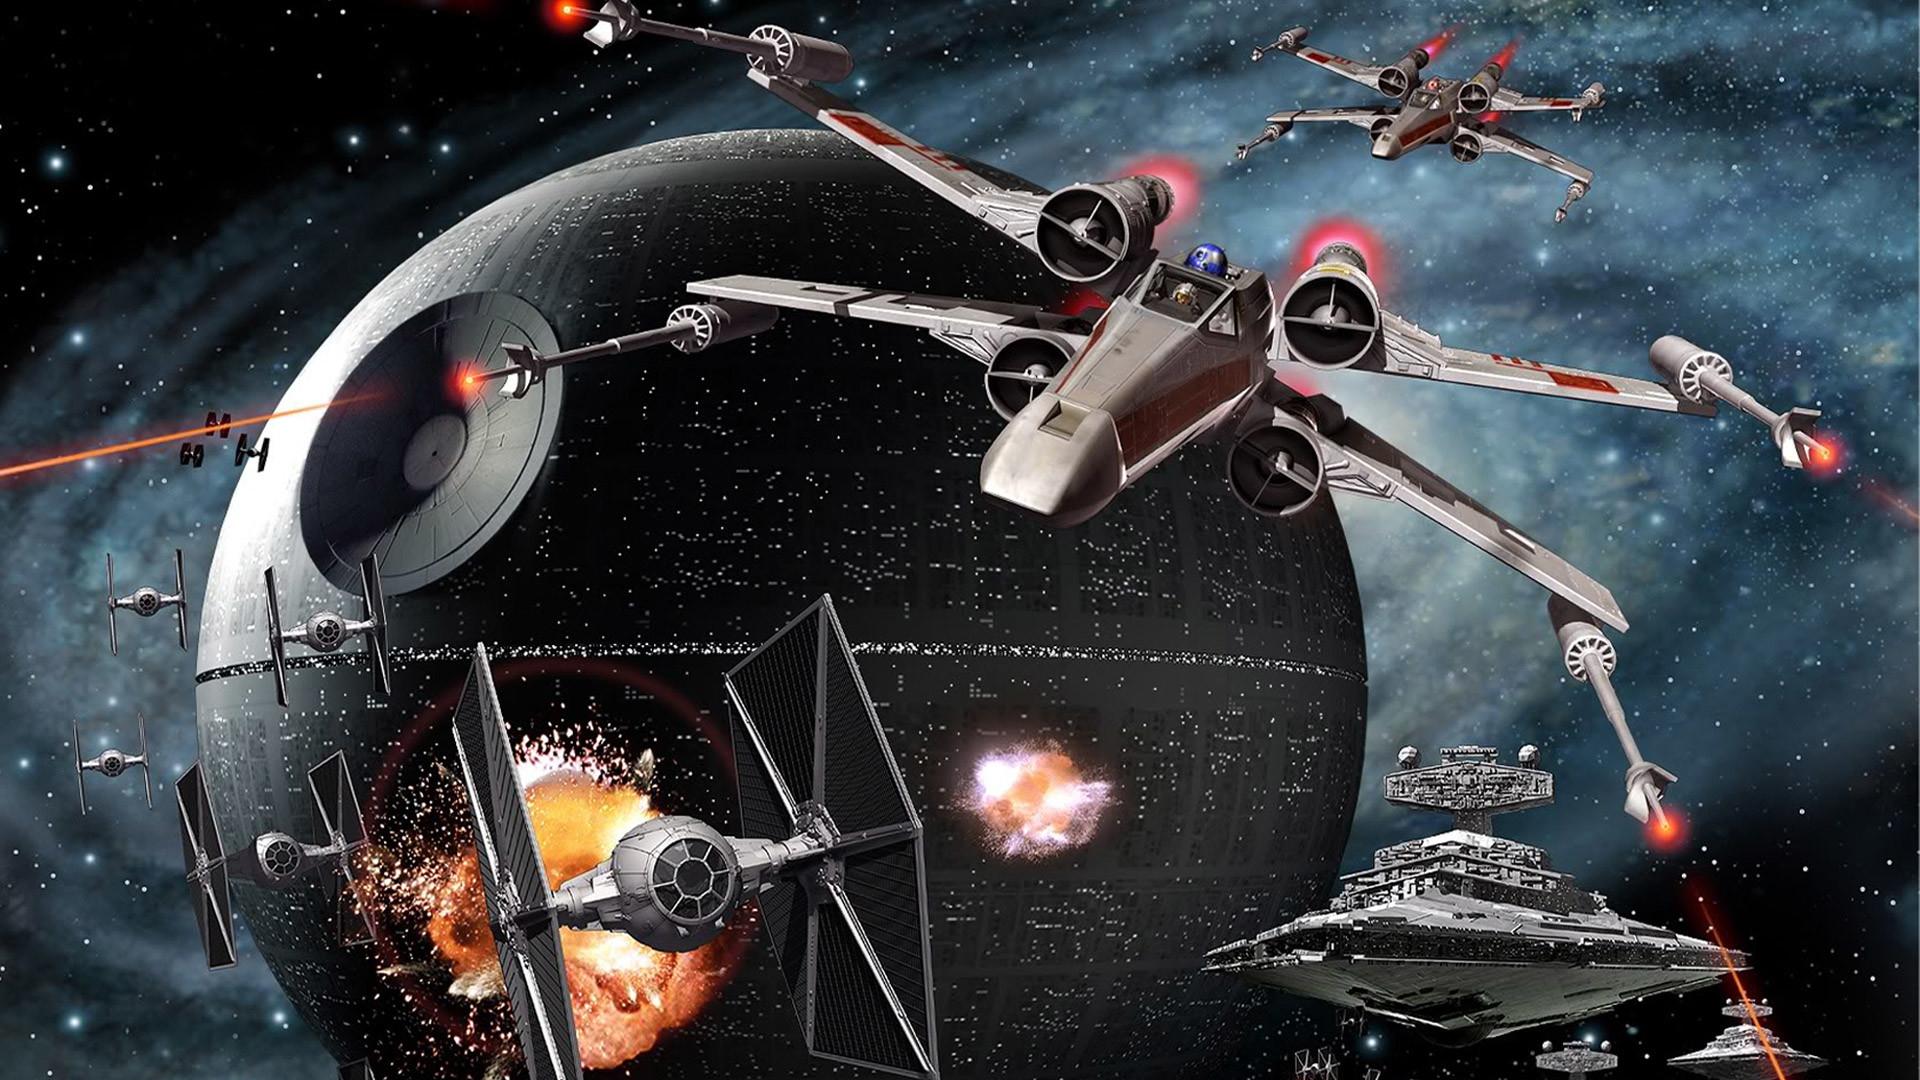 Star Wars War Ships Wallpaper High Resolution Wallpaper Full Size